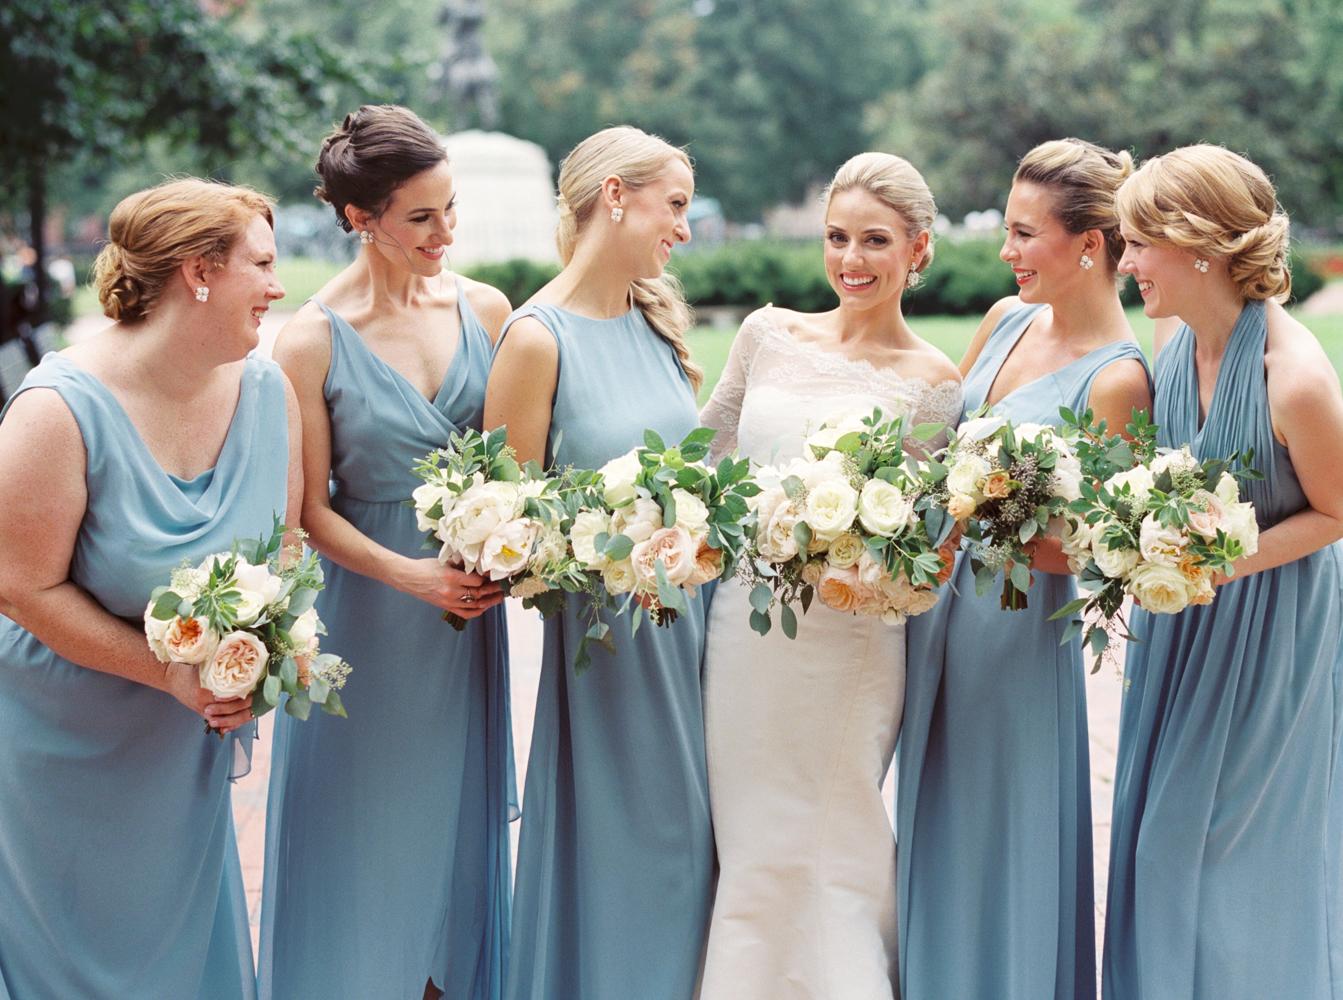 Kate-Ignatowski-Photography-Rachel-Tommy-Wedding-038.jpg